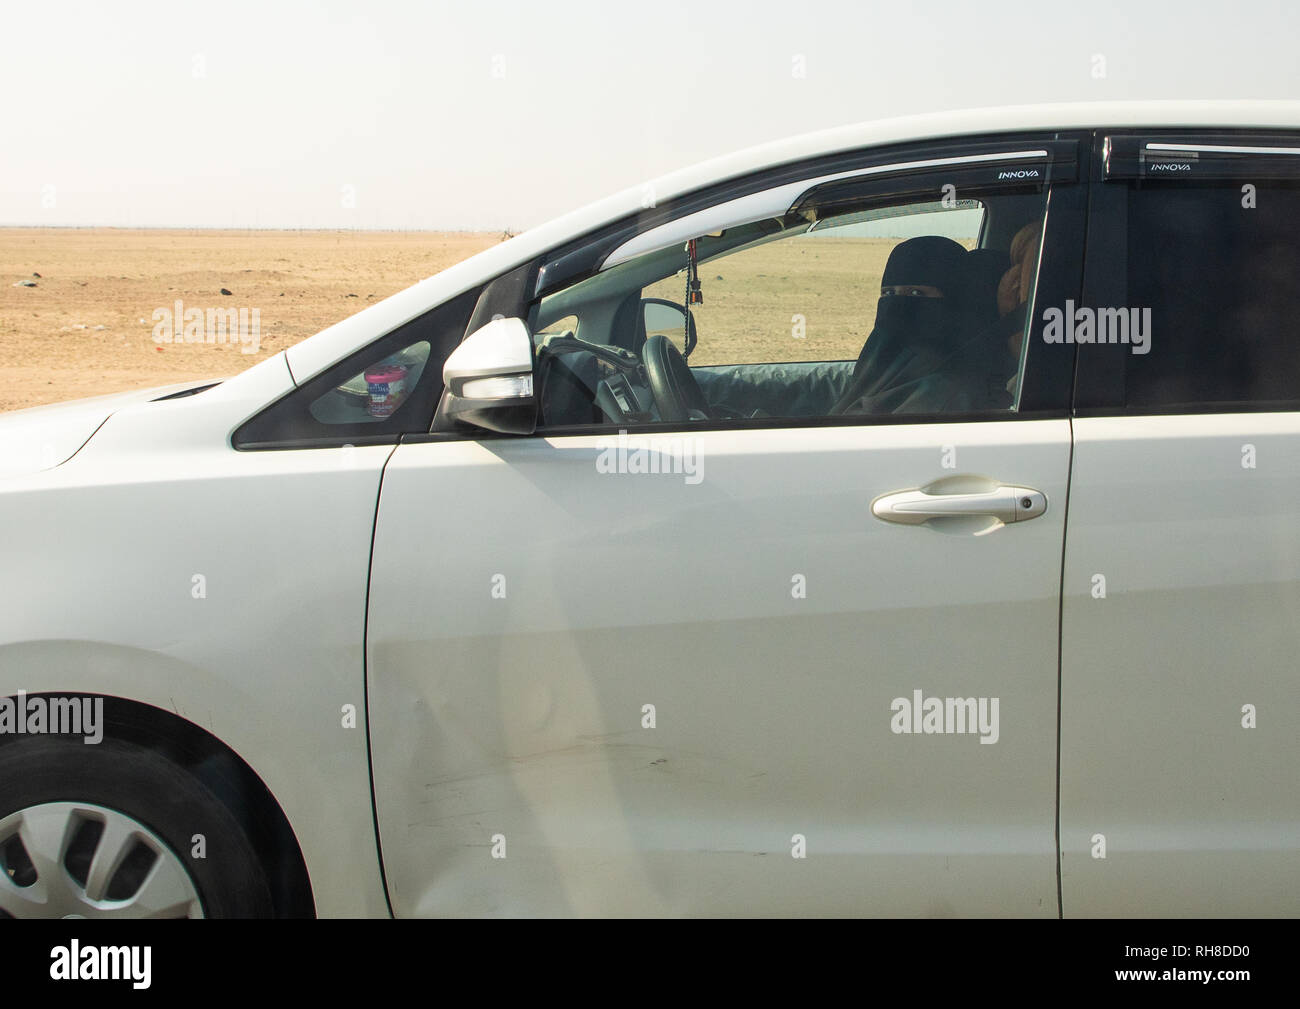 Saudi woman driving alone in a car on the highway, Mecca province, Jeddah, Saudi Arabia - Stock Image